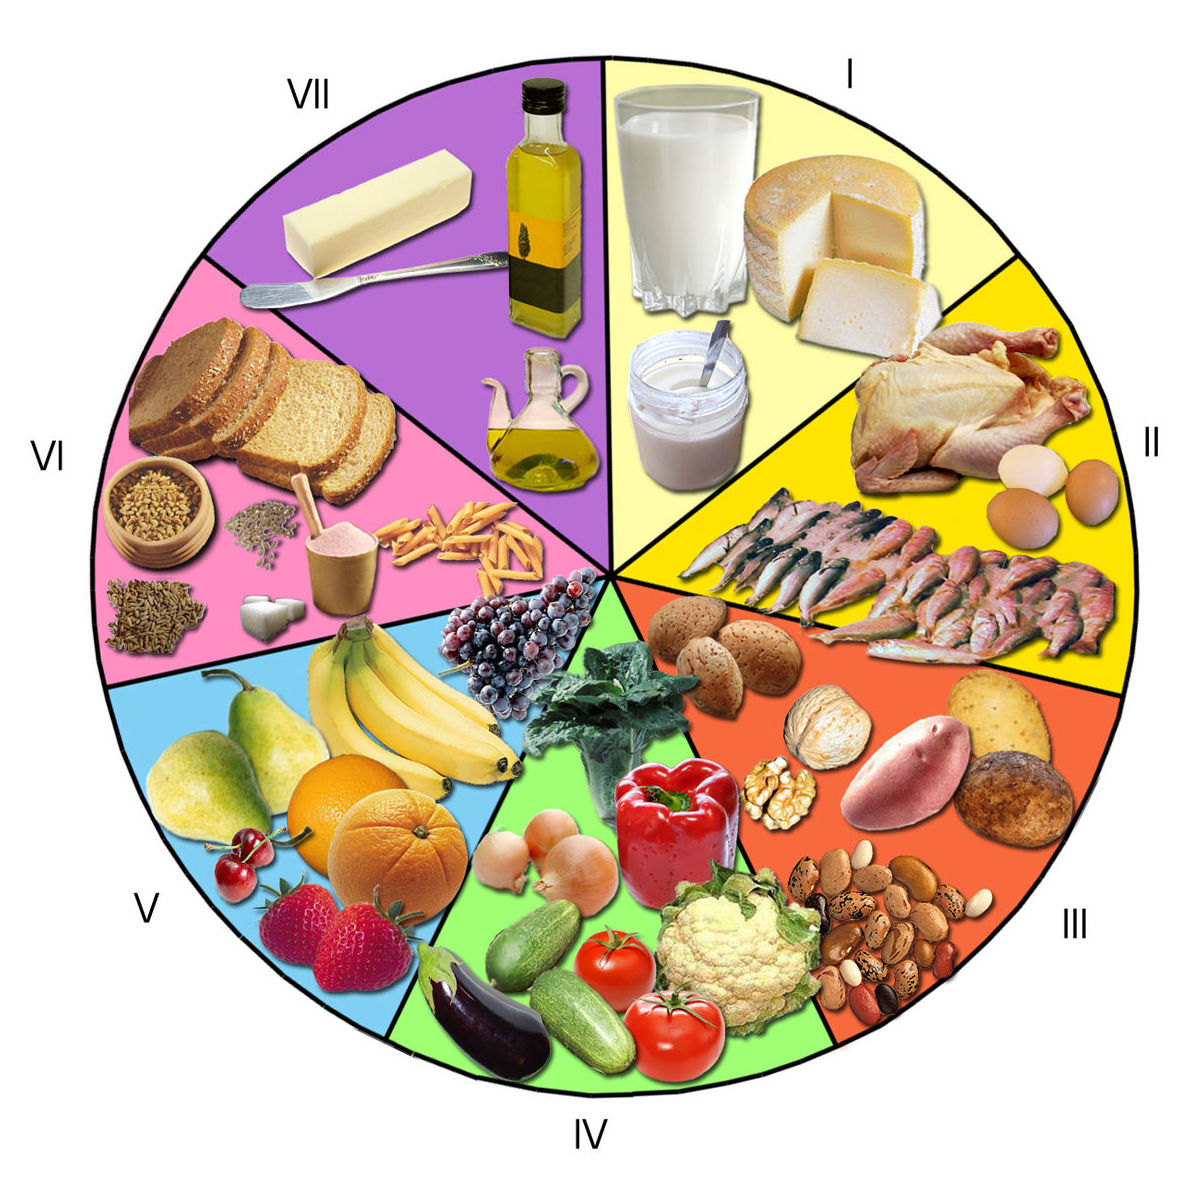 Intolerancia alimenticia: Análisis Clínicos  de Laboratorio Dra. Teresa Marín